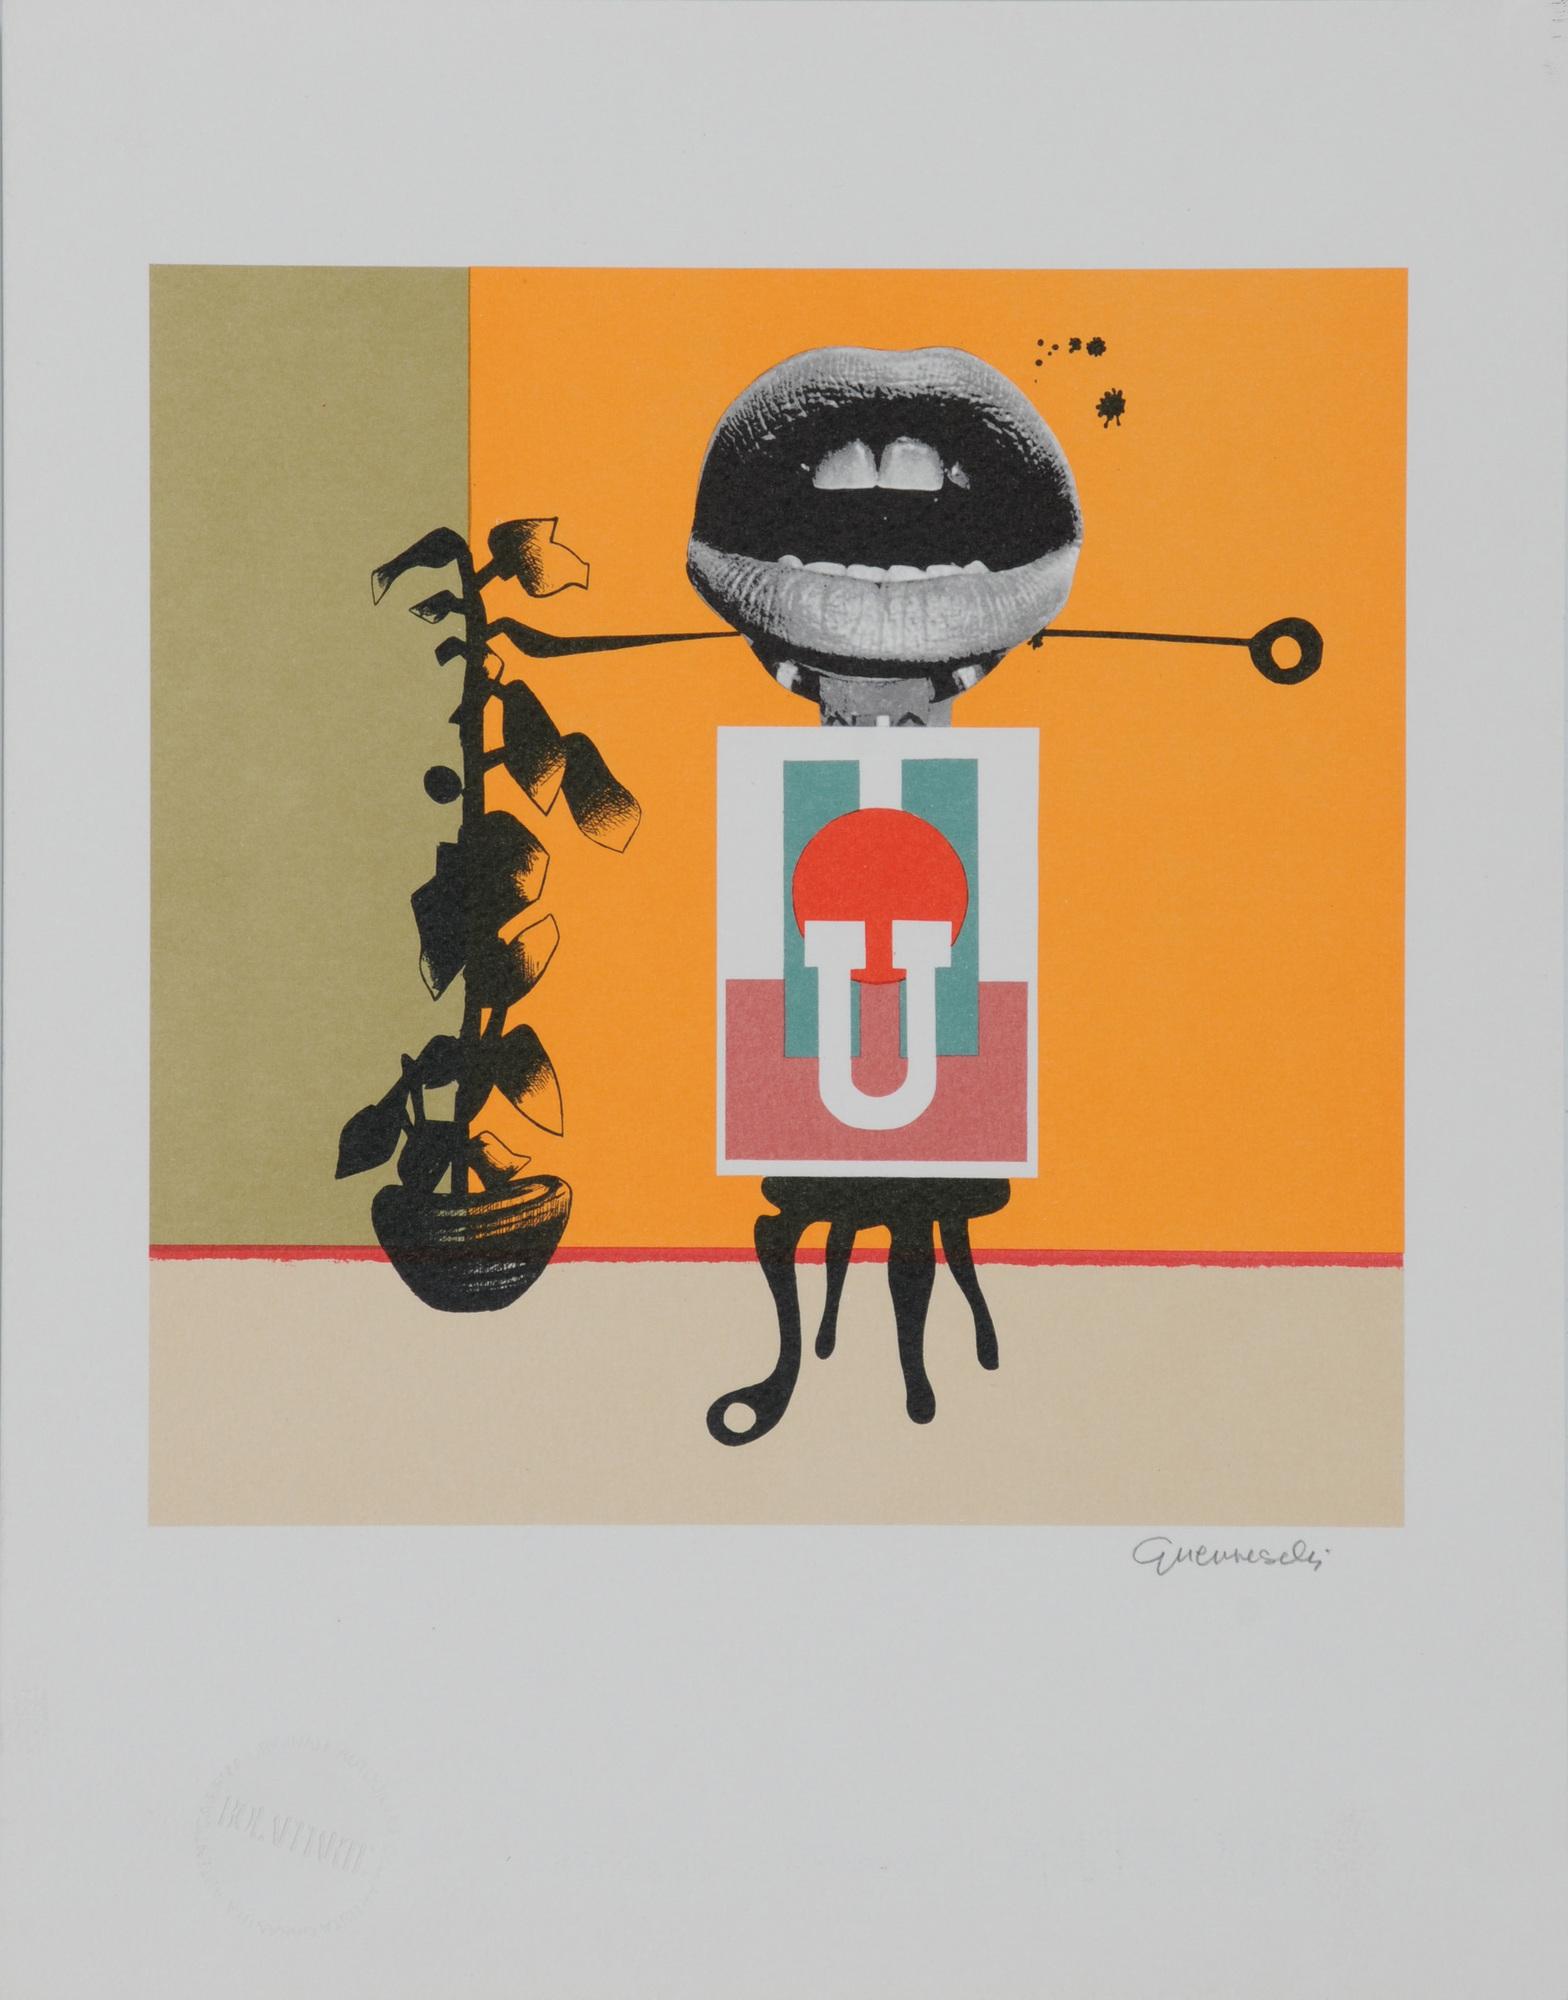 Grafik, 24 sheets: César (2); J. Beuys; M. Marini; W. Lam; R. Rauschenberg; E. Kienholz; M. Schifano; F. Plessi; G. Guerreschi; Christoforou etc.